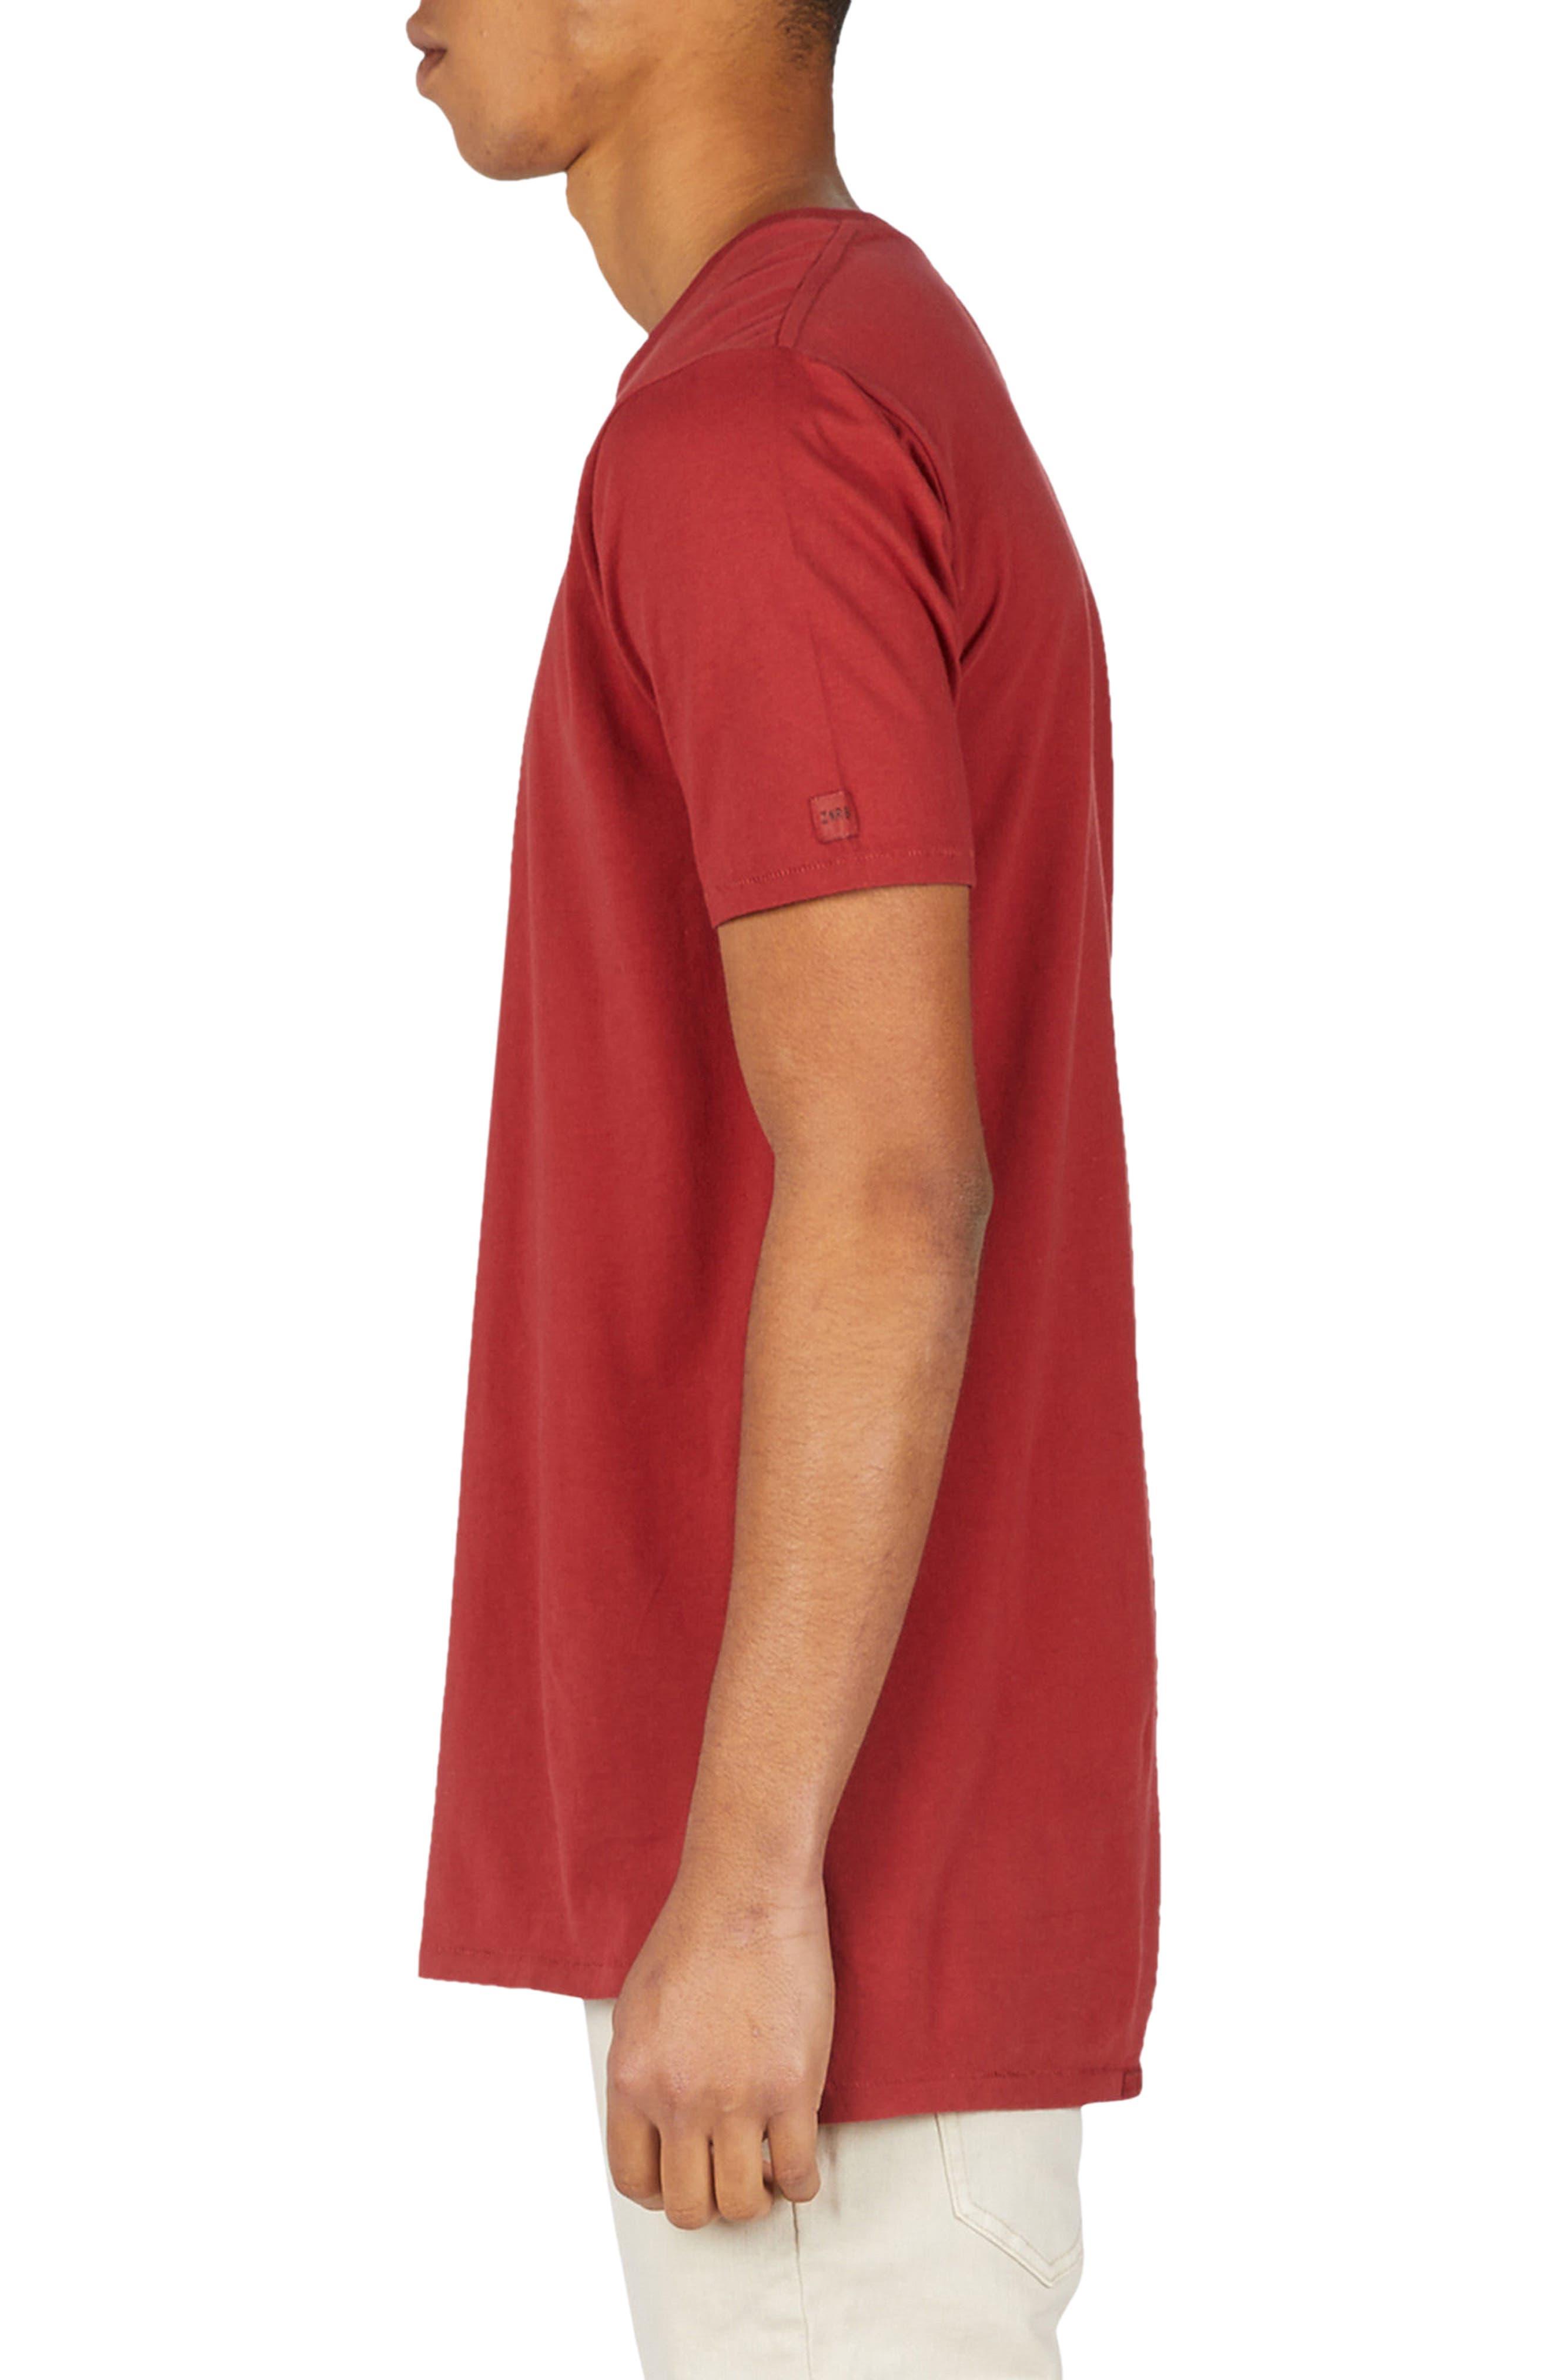 ZANEROBE,                             Flintlock T-Shirt,                             Alternate thumbnail 3, color,                             601